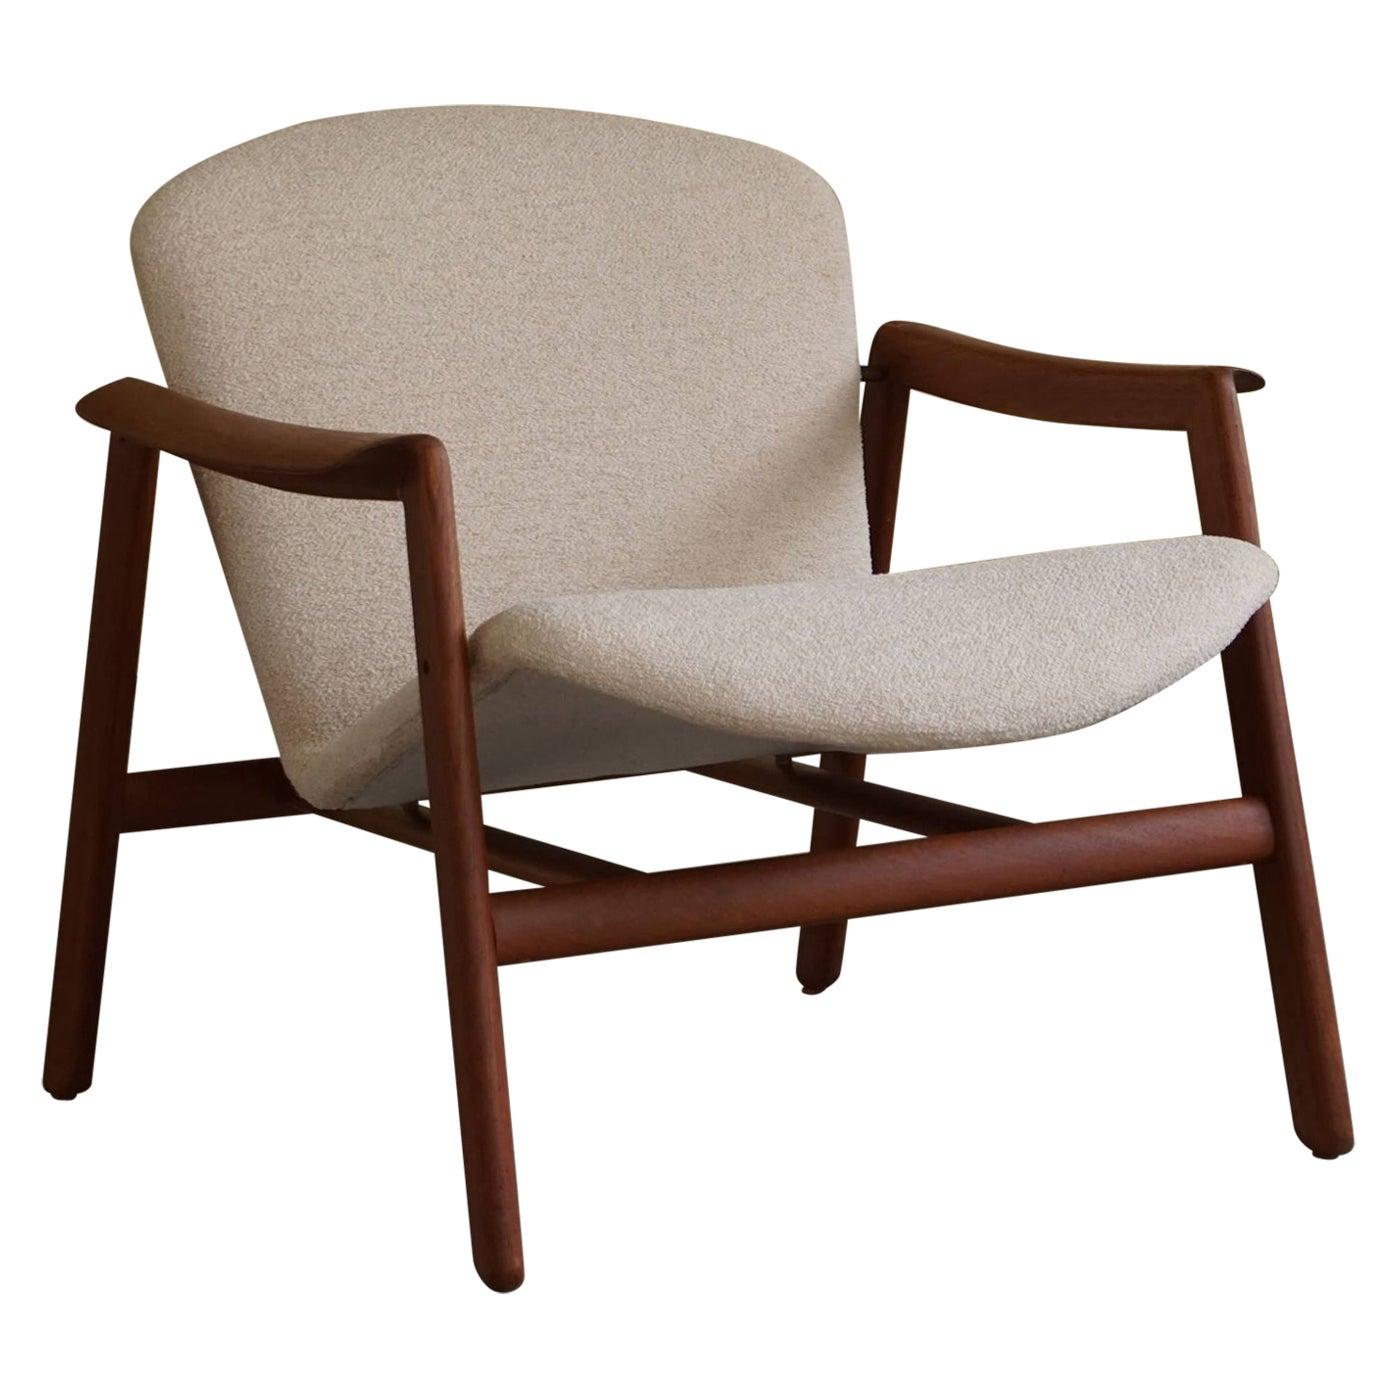 Mid Century Danish Lounge Chair in Teak and Bouclé, Finn Juhl Style, 1960s